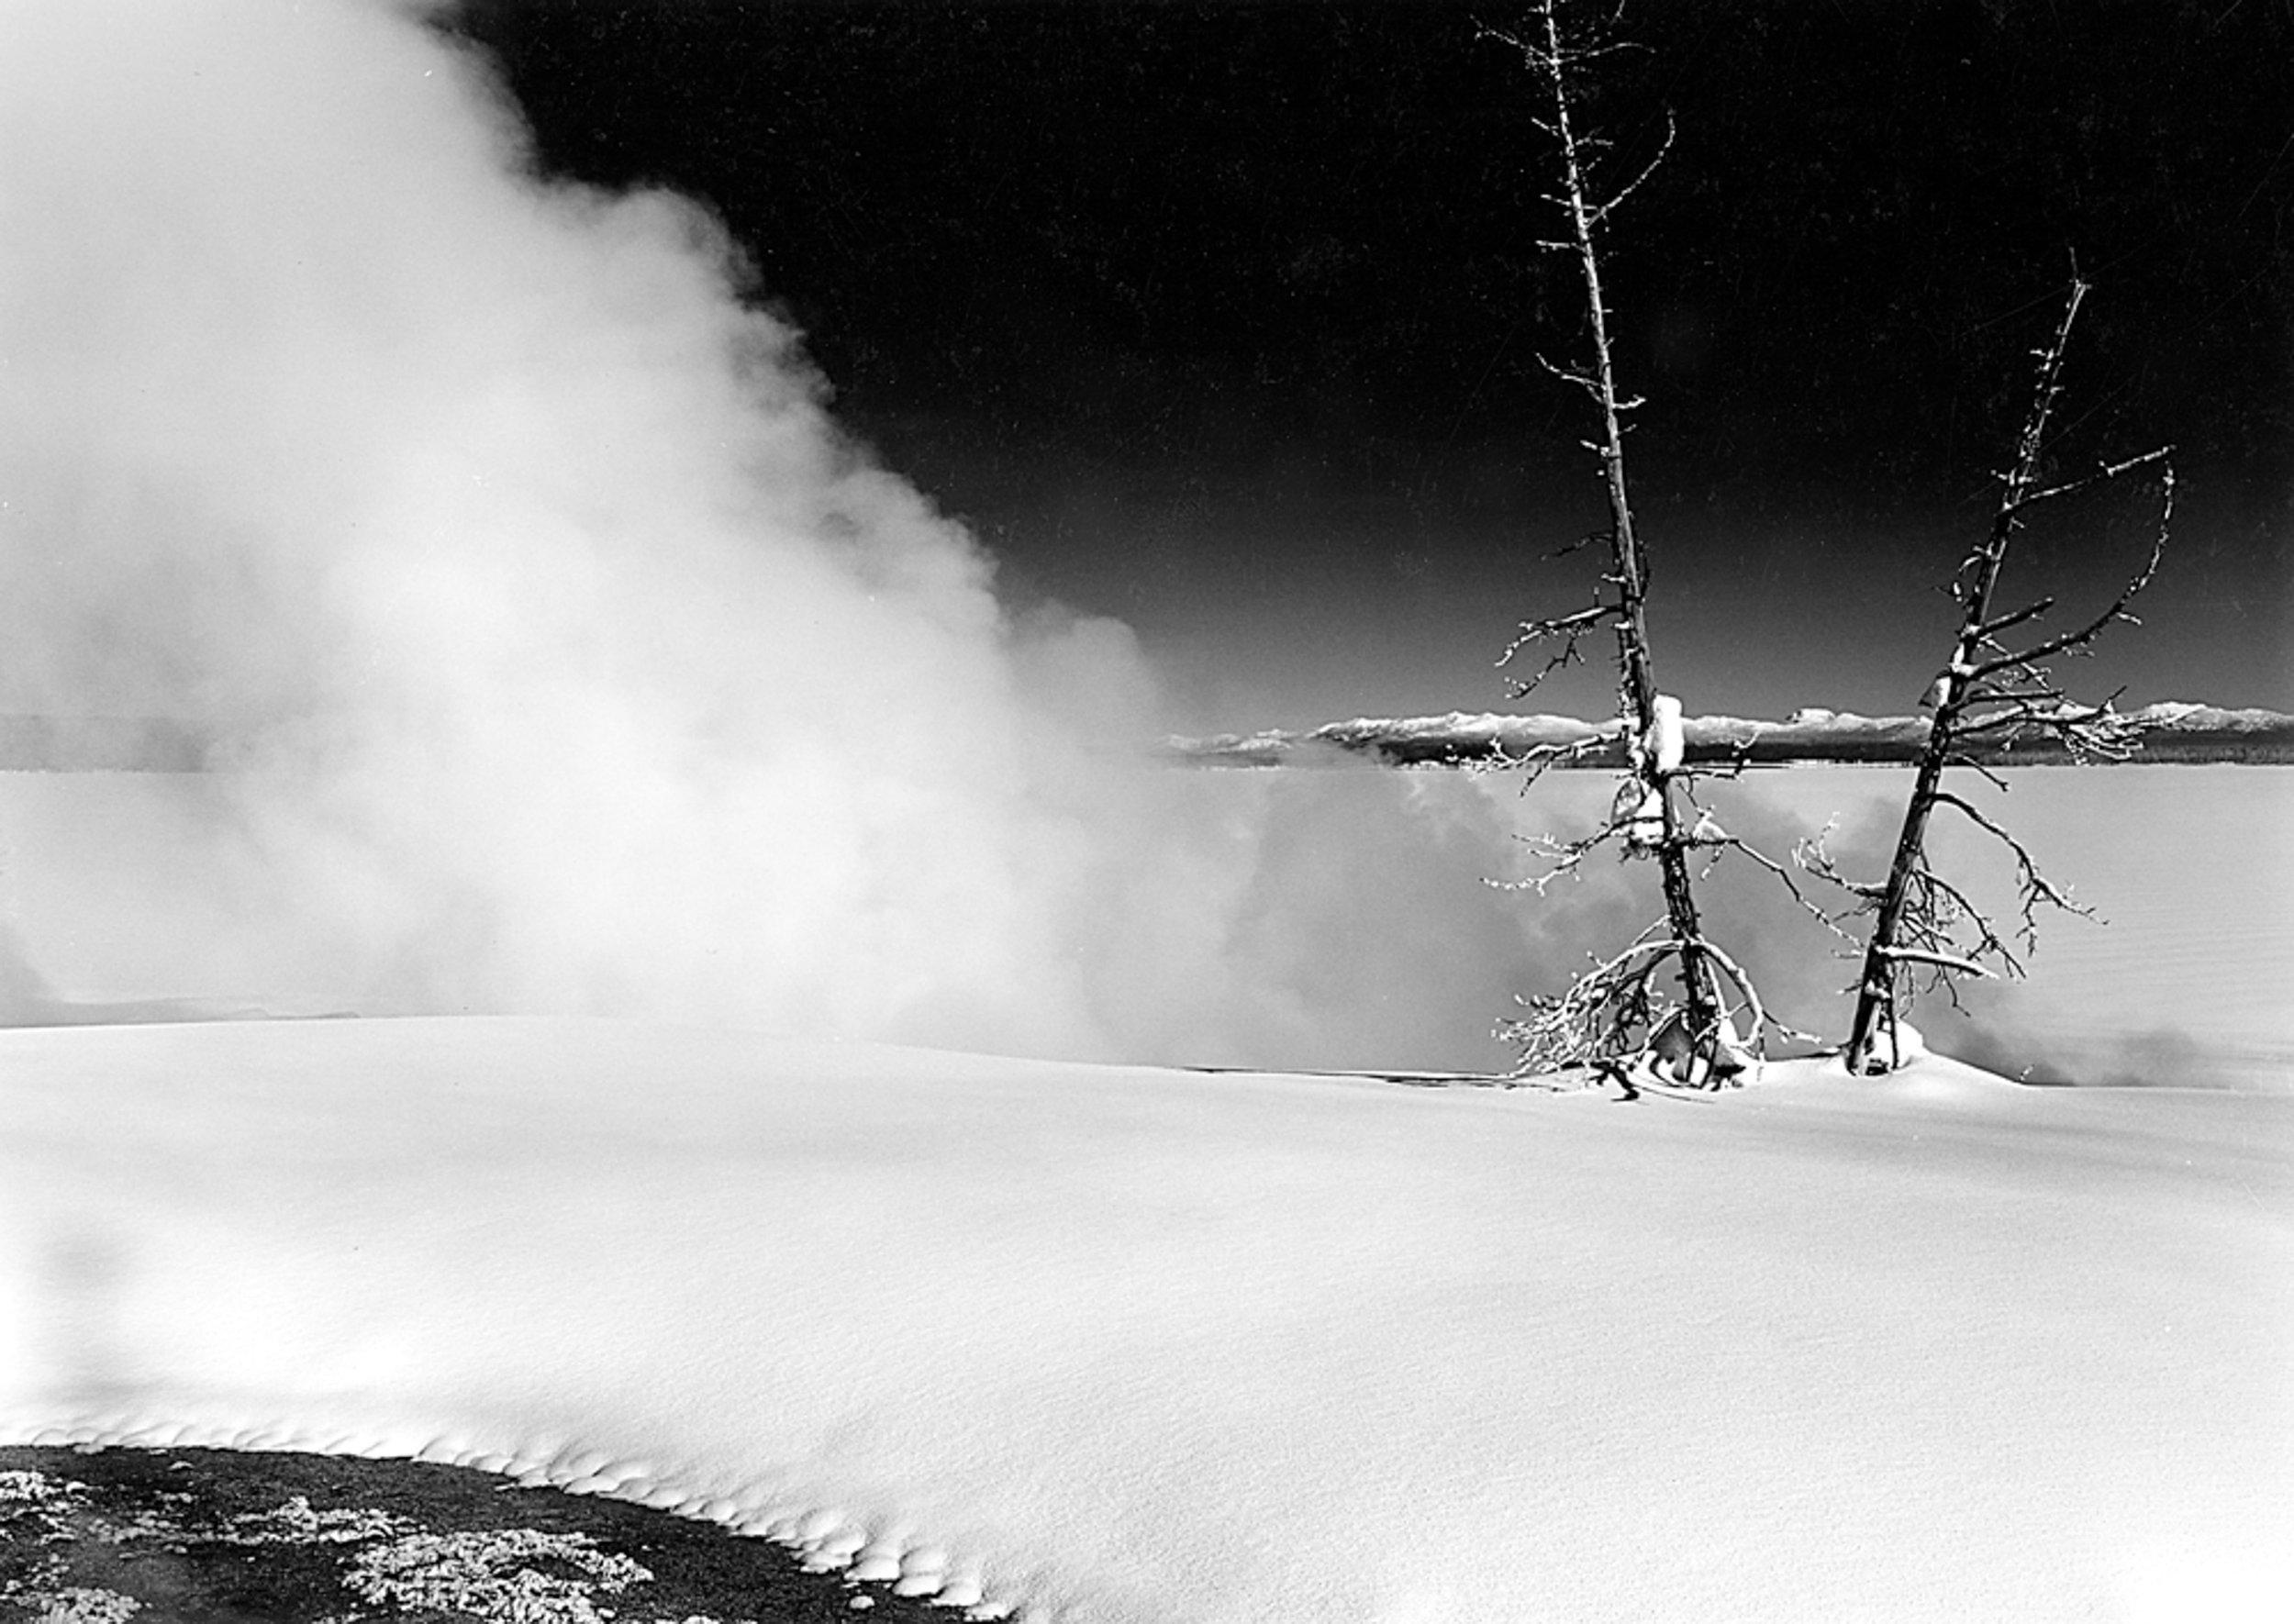 West Thumb, Geyser Basin Yellowstone Lake, Wyoming